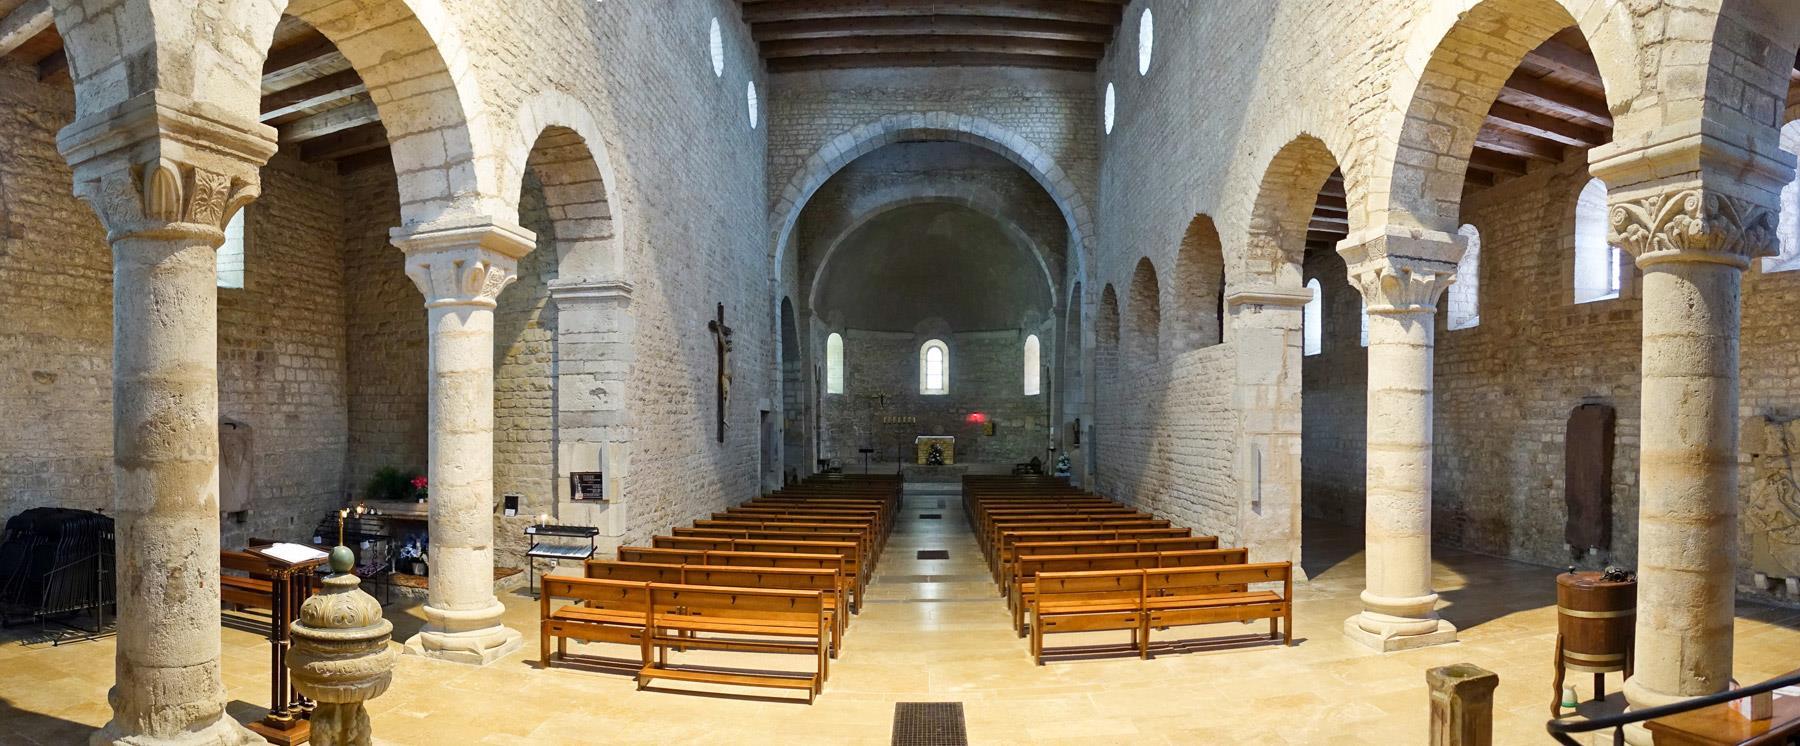 Romanische Kirche St. Jacques (12. Jh.)